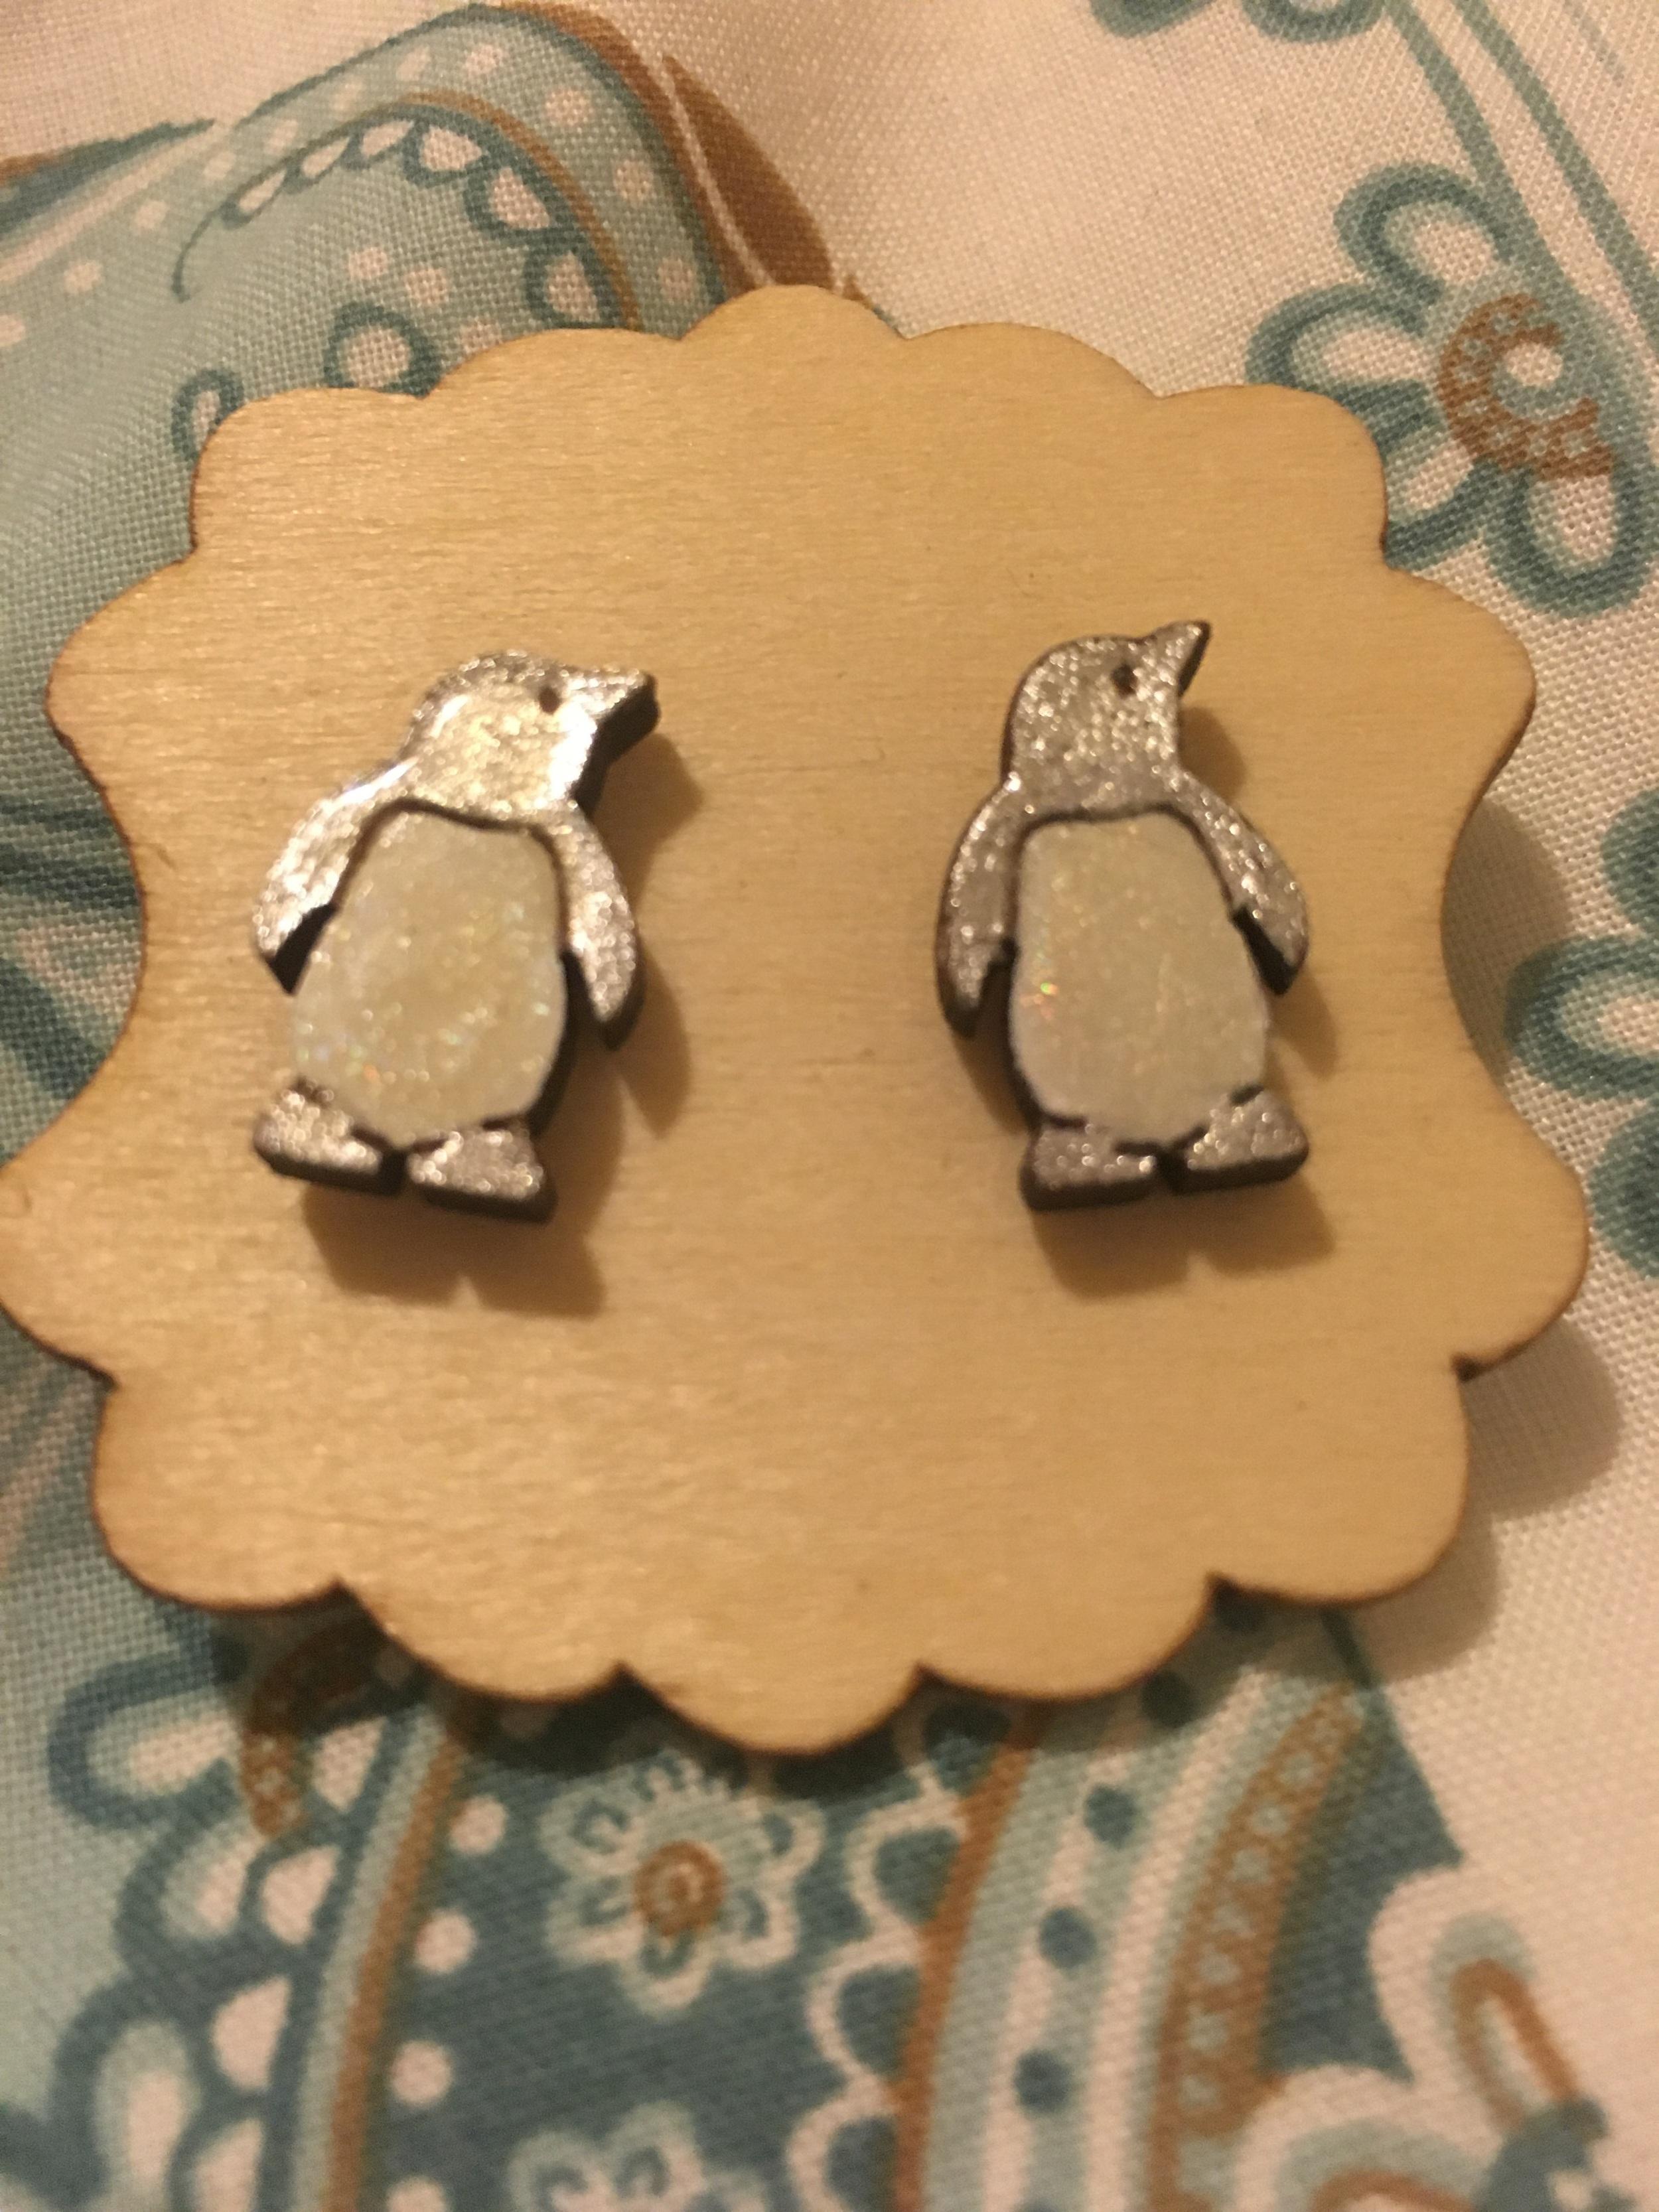 Day 19 & Penguins!